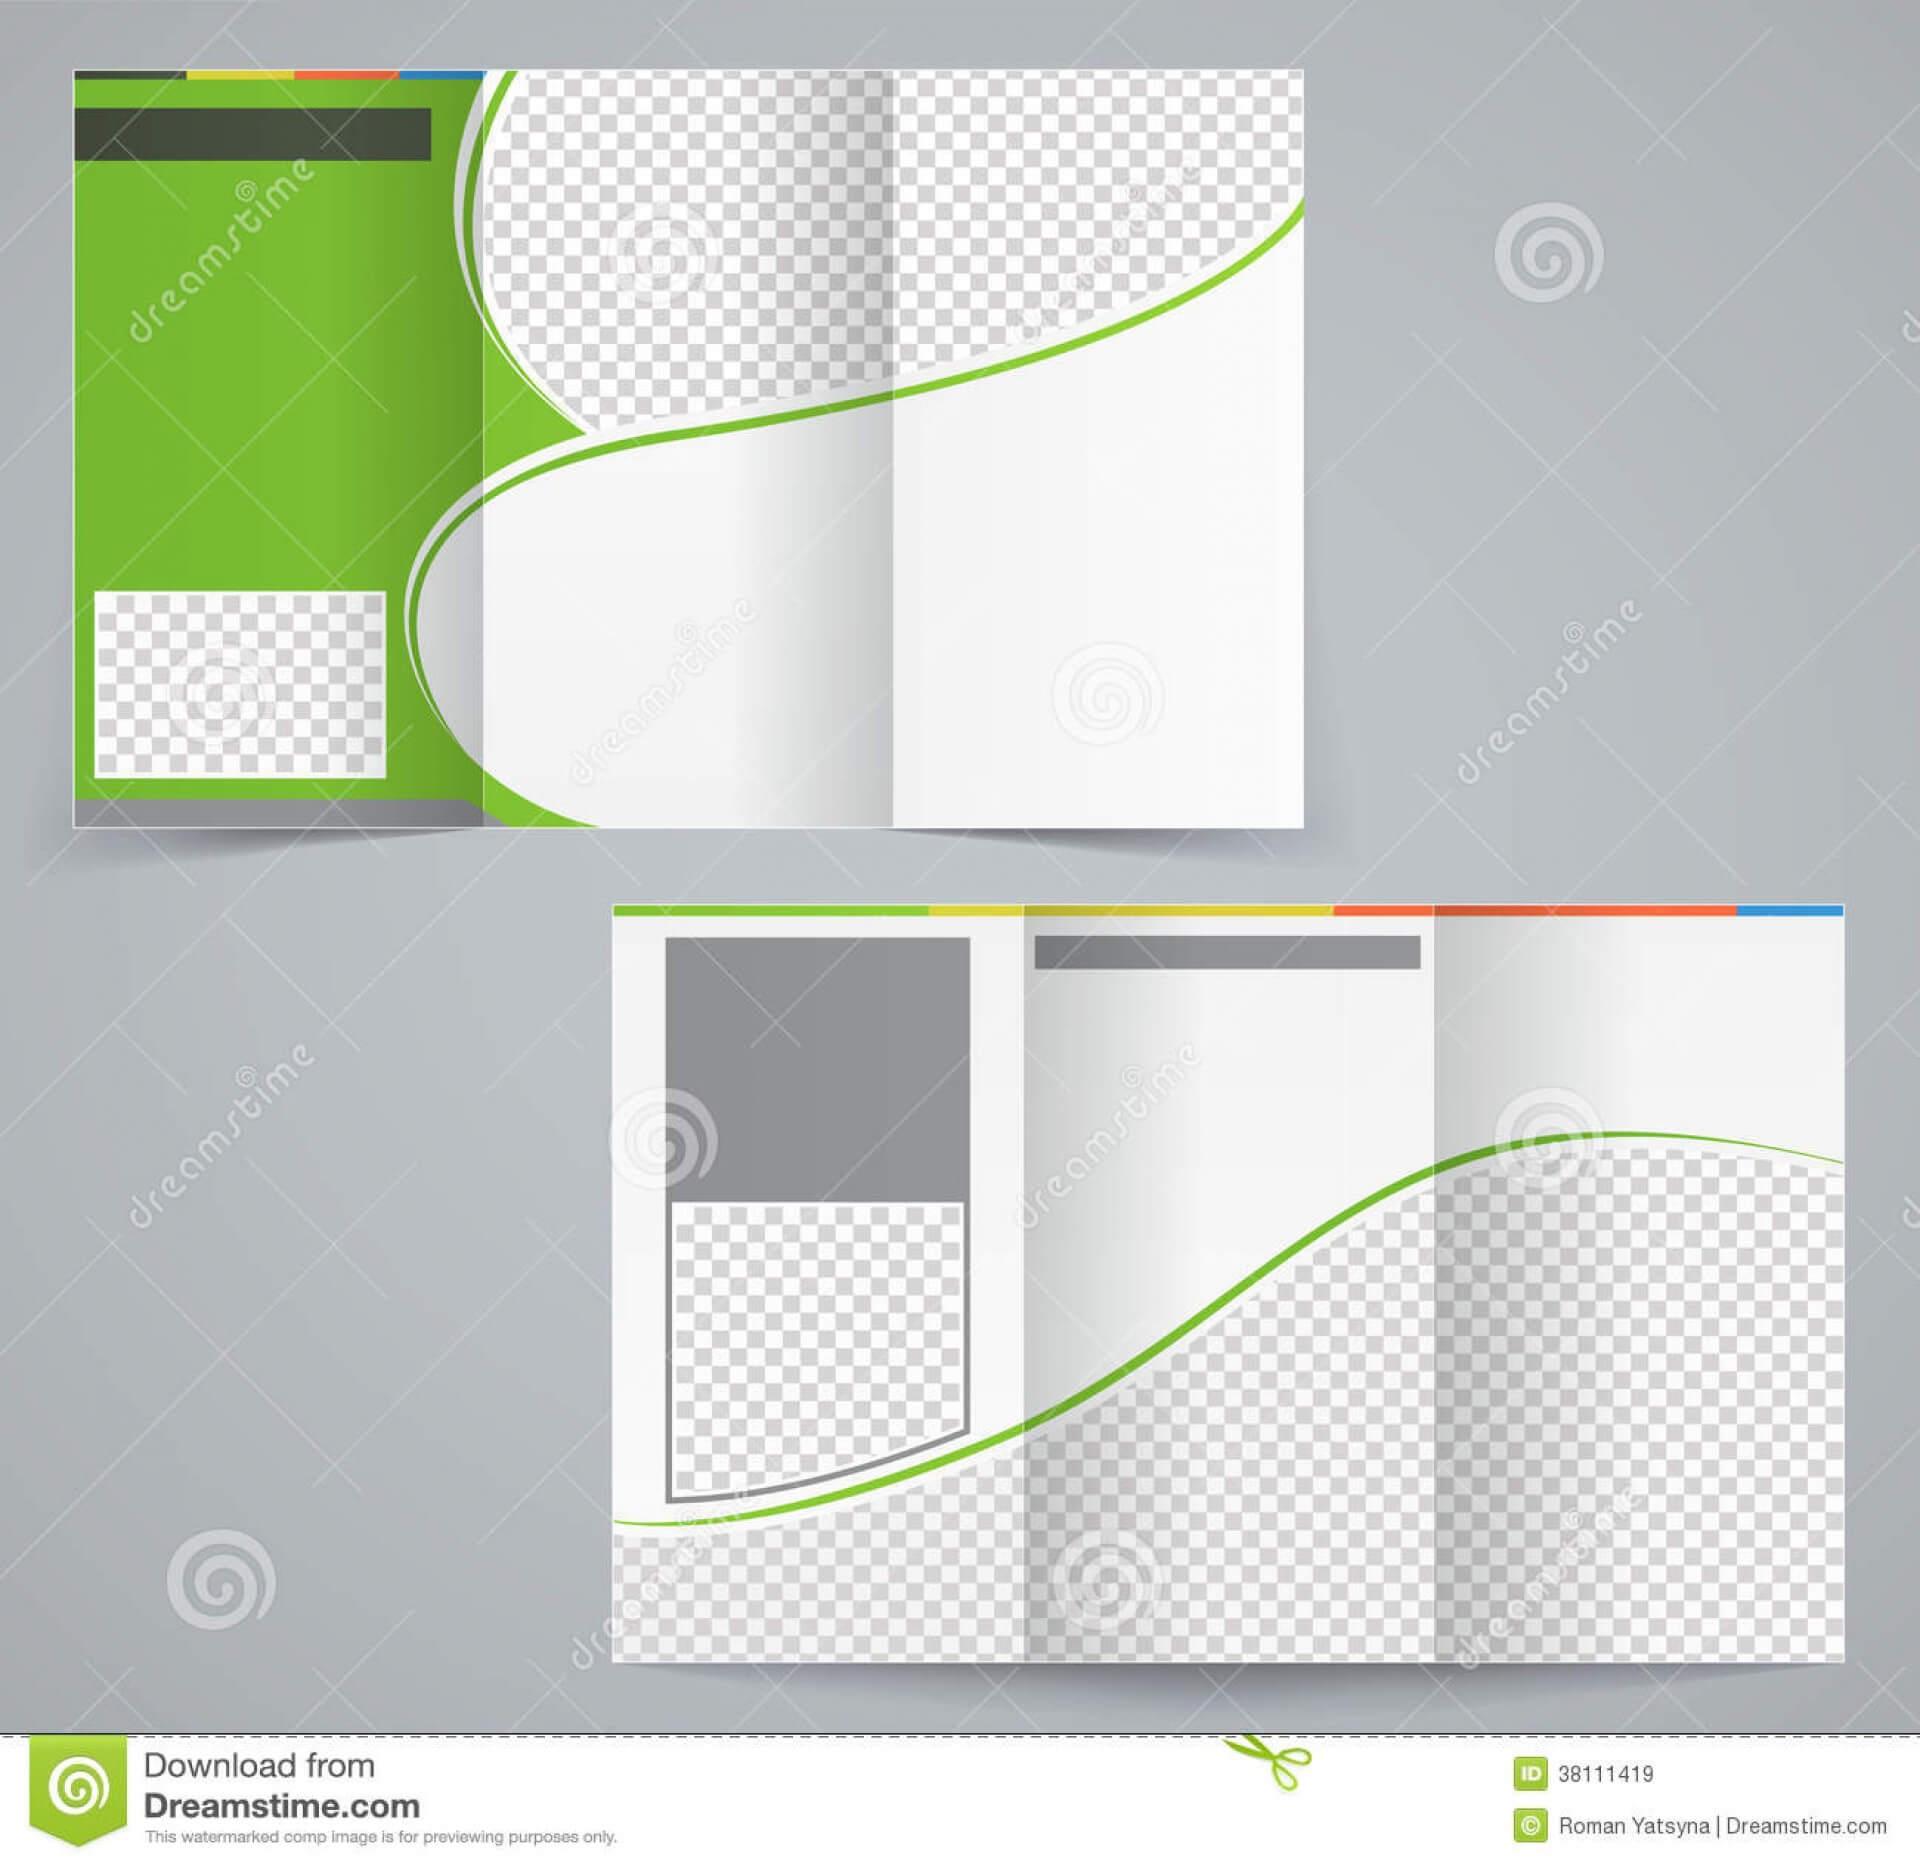 022 Tri Fold Business Brochure Template Vector Green Design For Brochure Template Illustrator Free Download